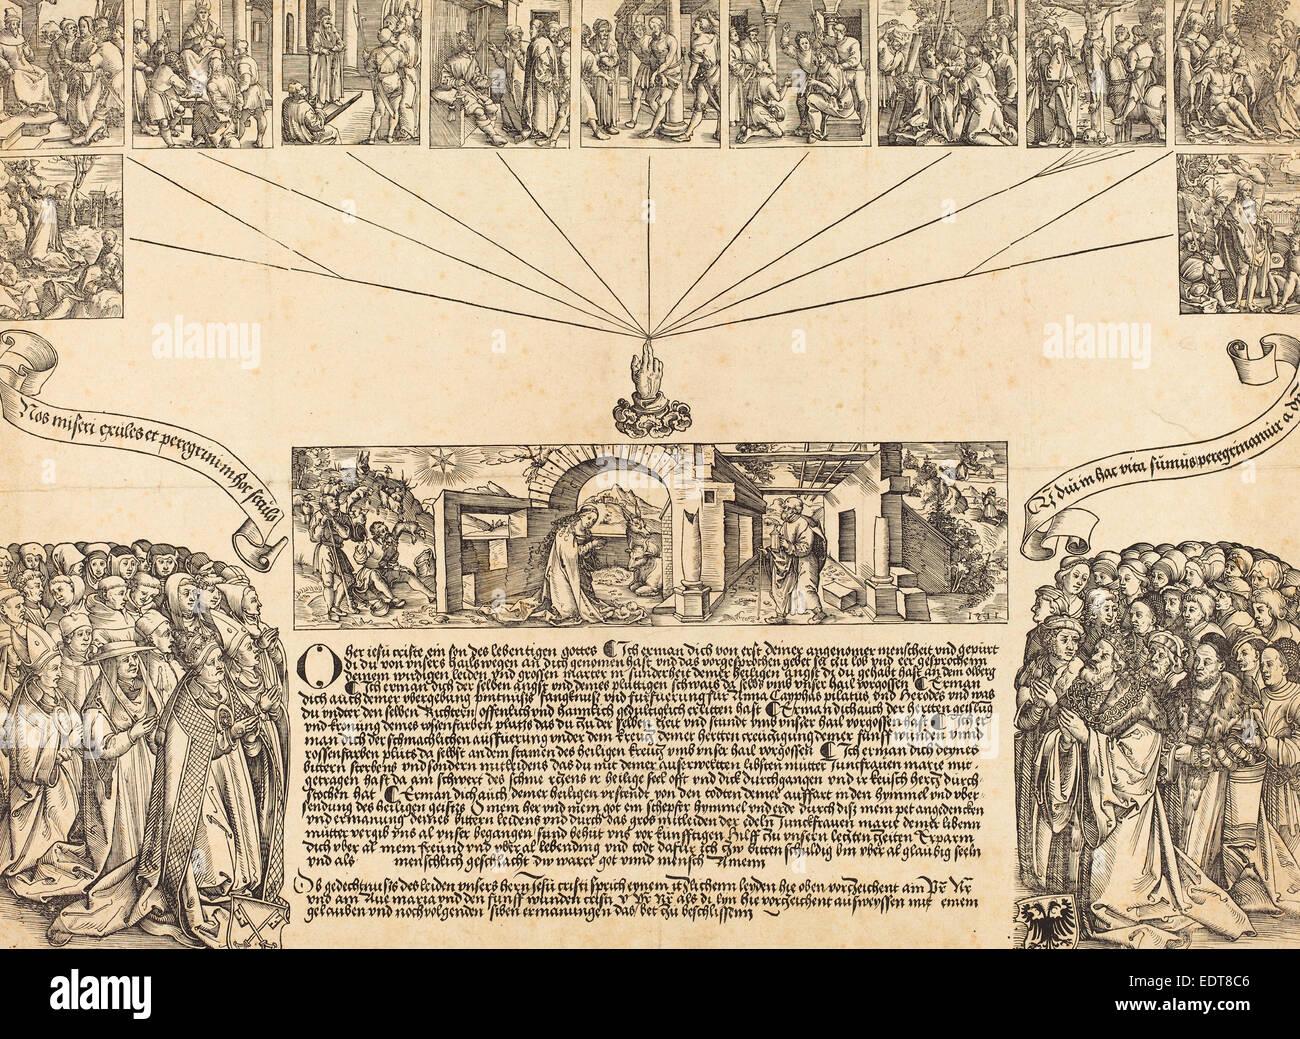 Wolf Traut (German, c. 1486 - 1520), The Nativity, woodcut - Stock Image